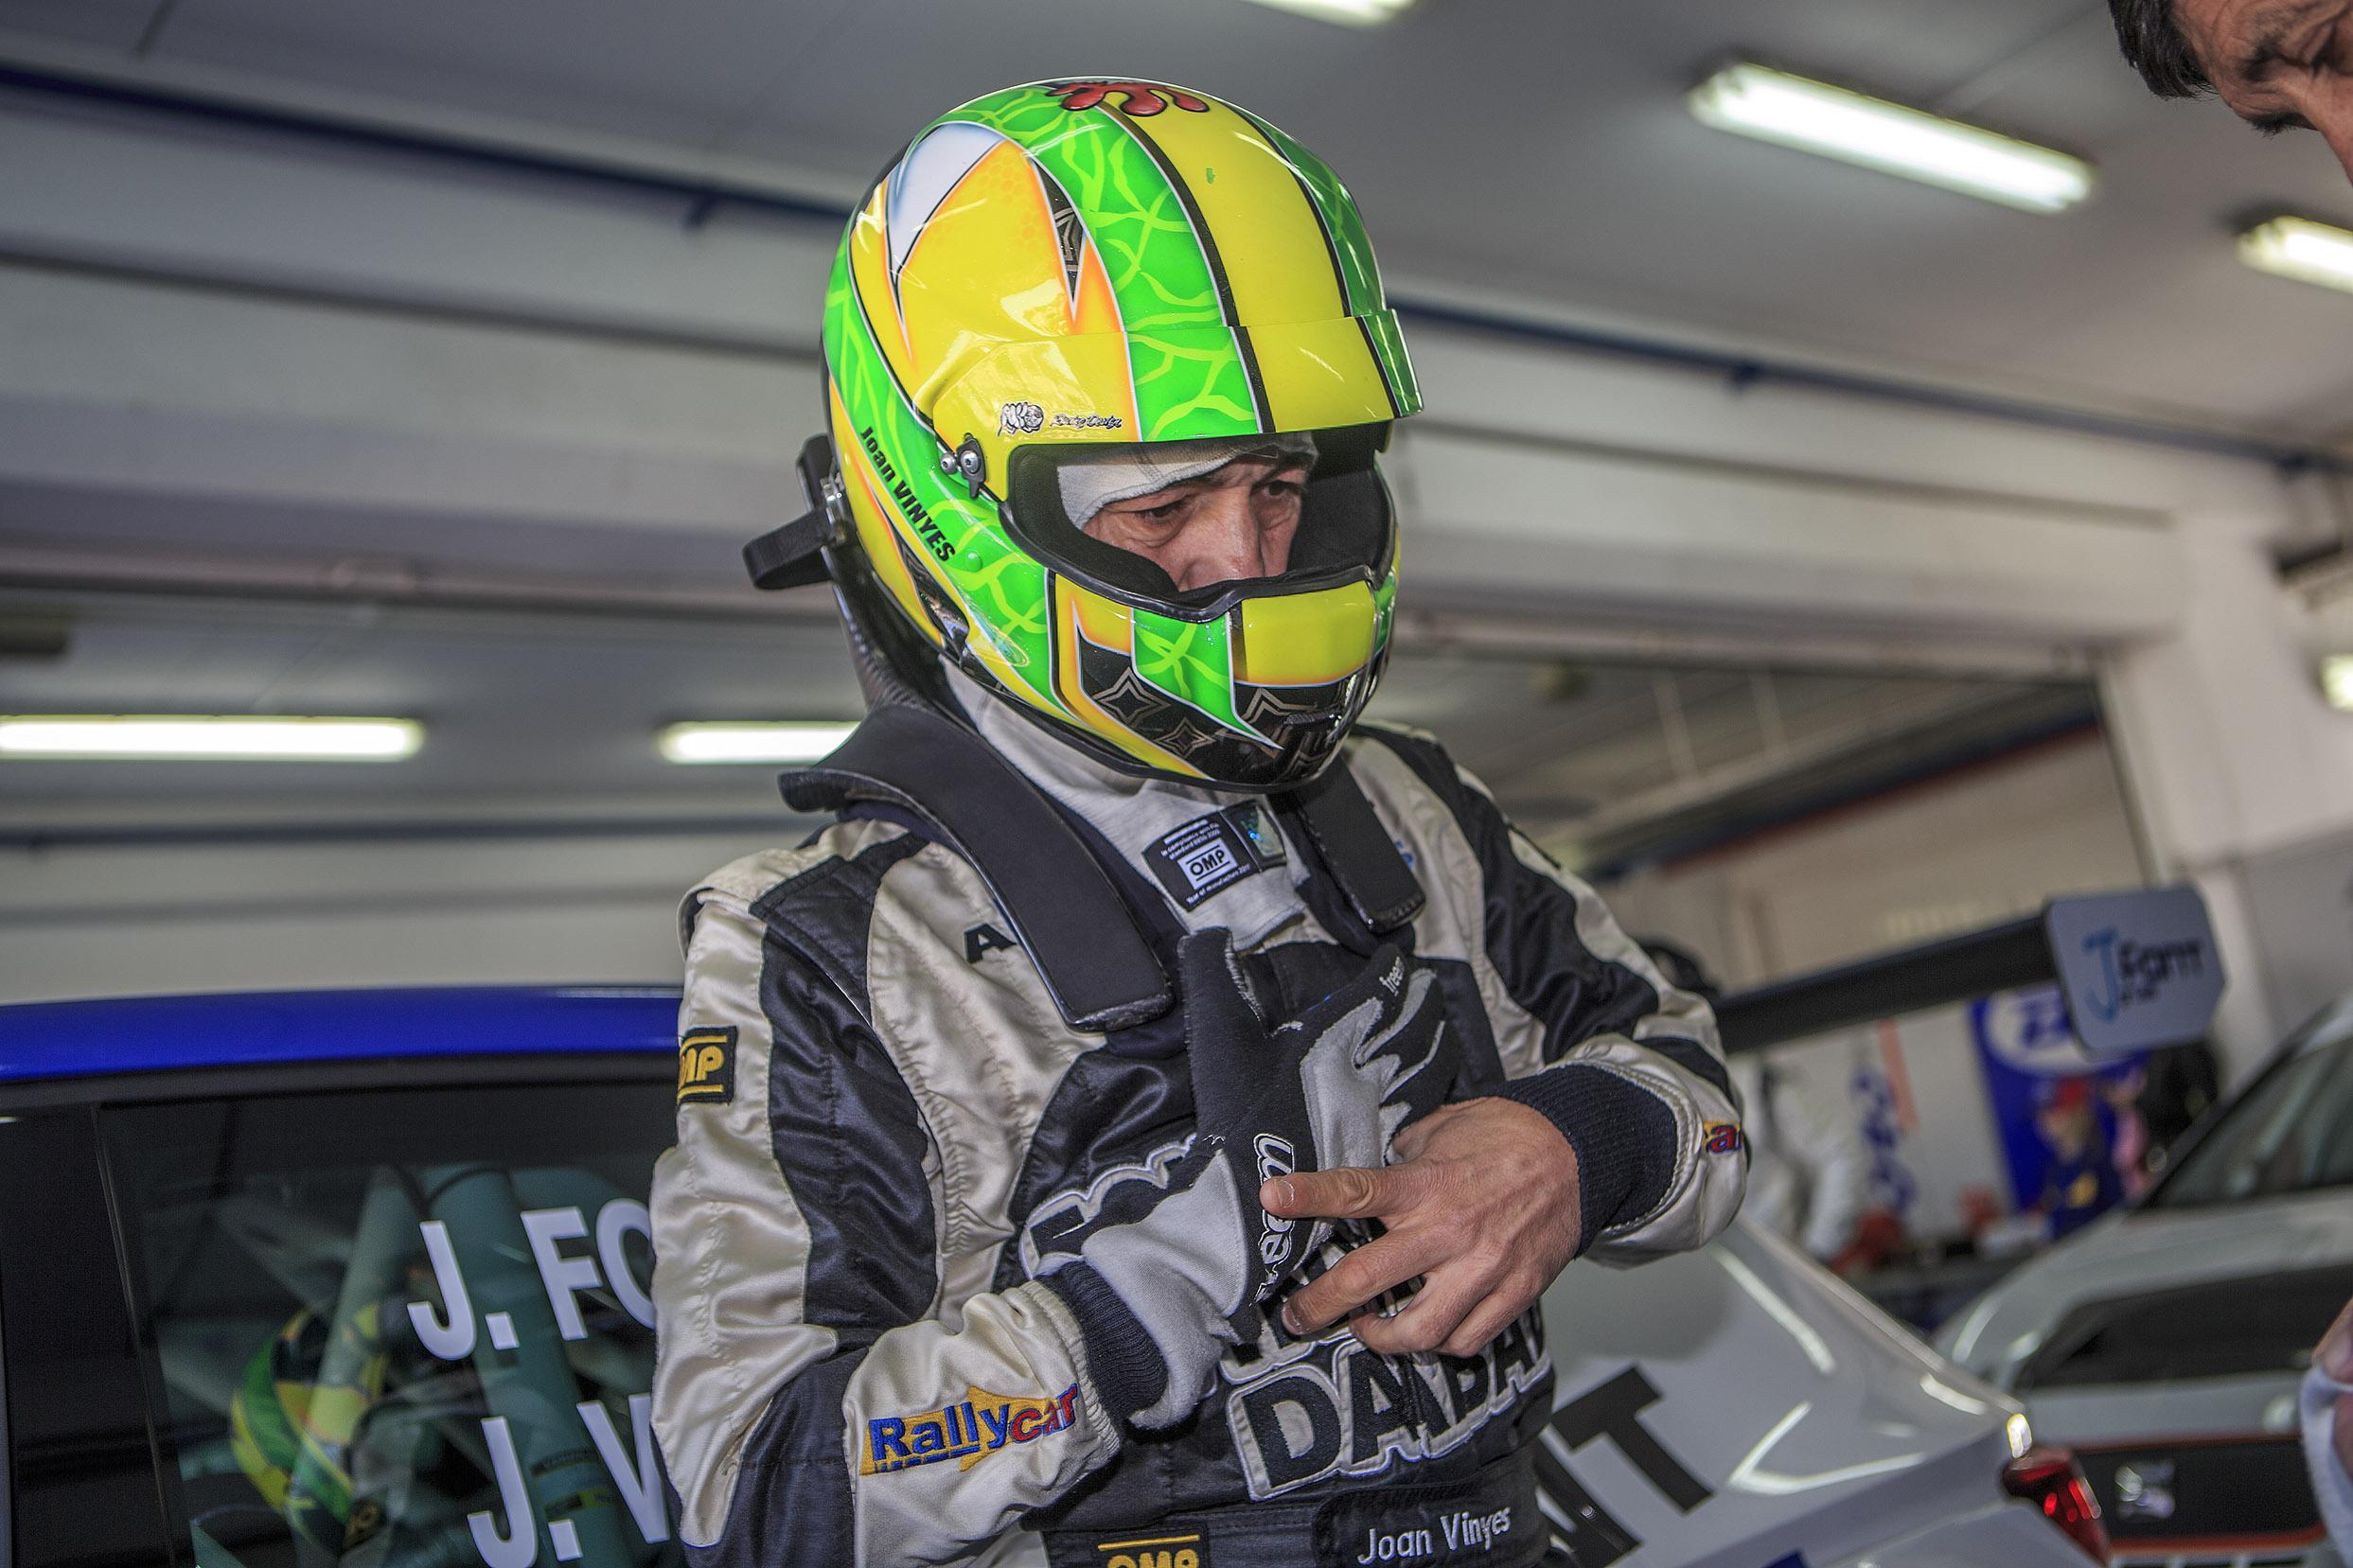 A Motorland, Joan Vinyes - Jaime Font buscaran el seu primer triomf en el CER 2017